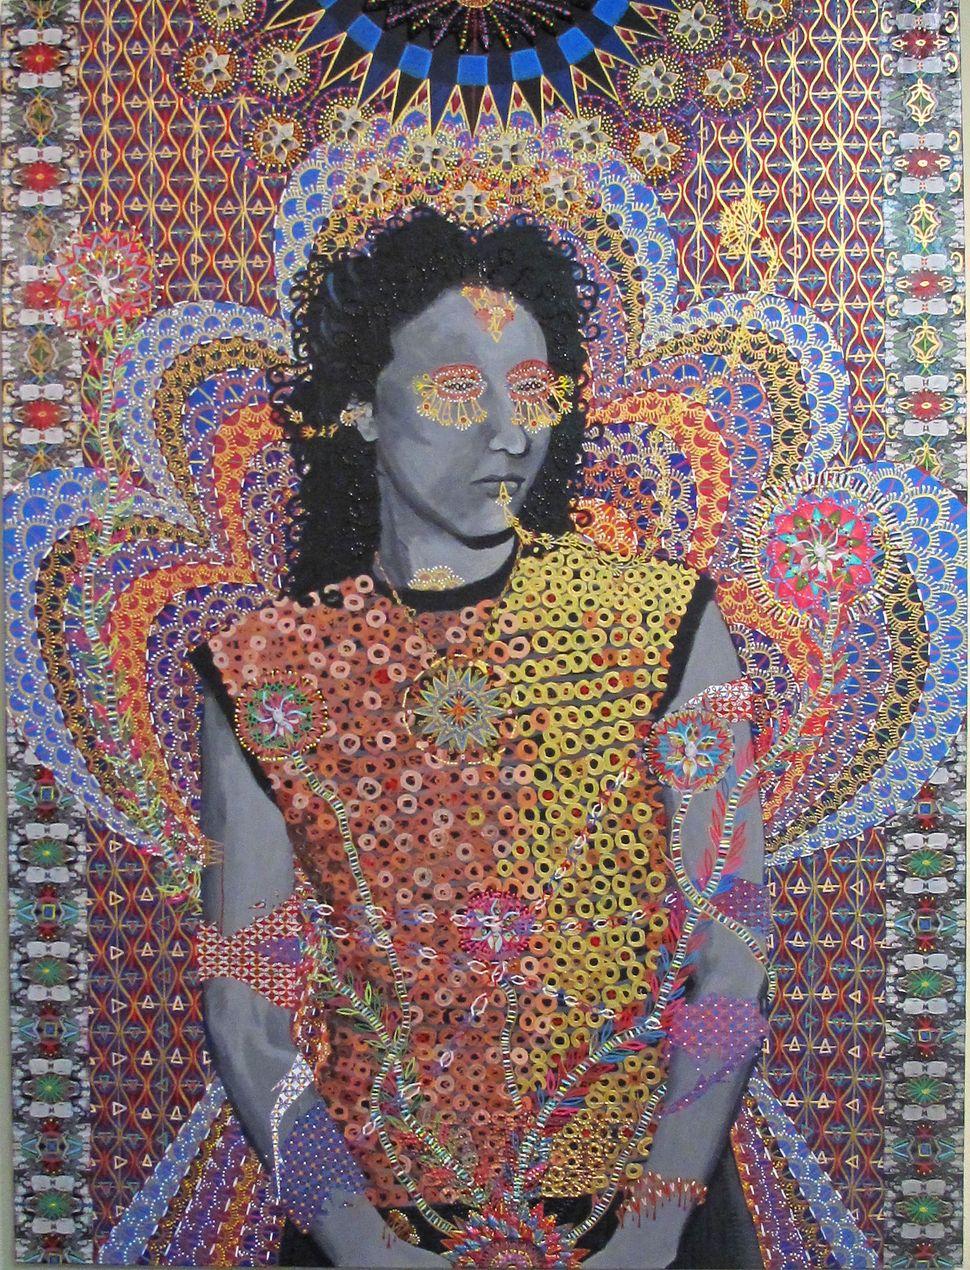 Les Femmes D Alger 1, 48x36 inches, 2012